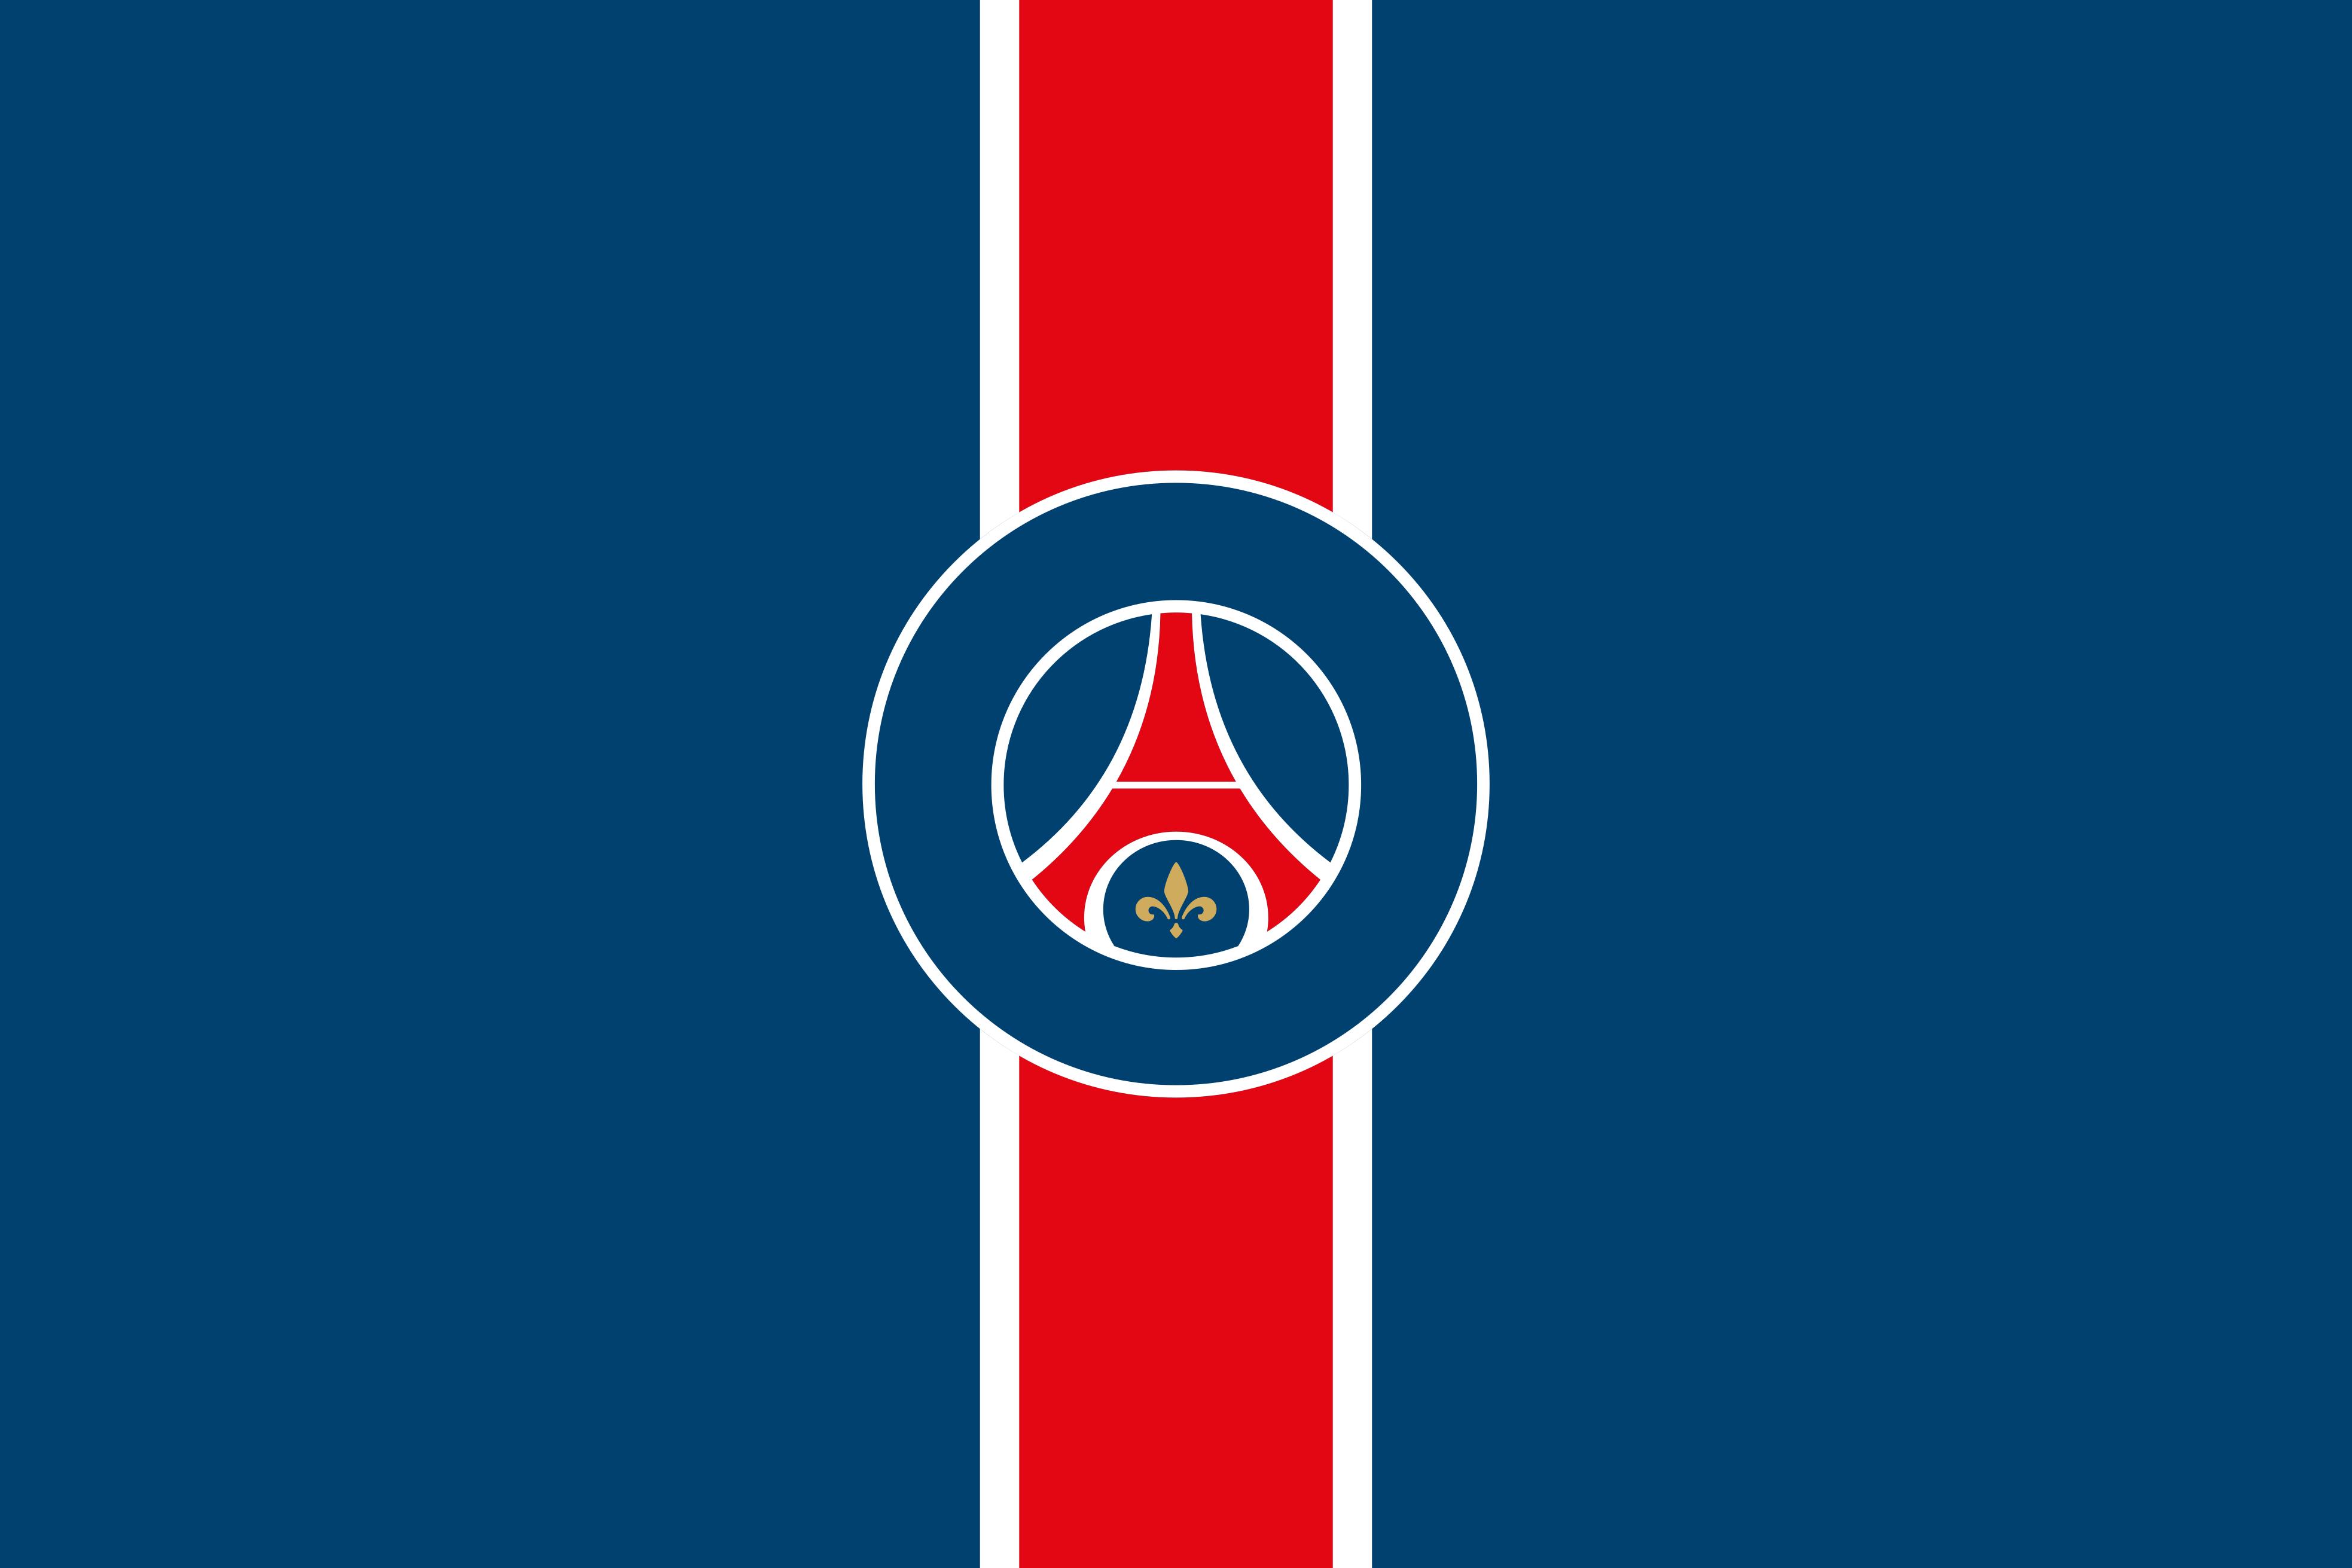 Paris Saint Germain F C 4k Ultra Hd Wallpaper Background Image 3933x2622